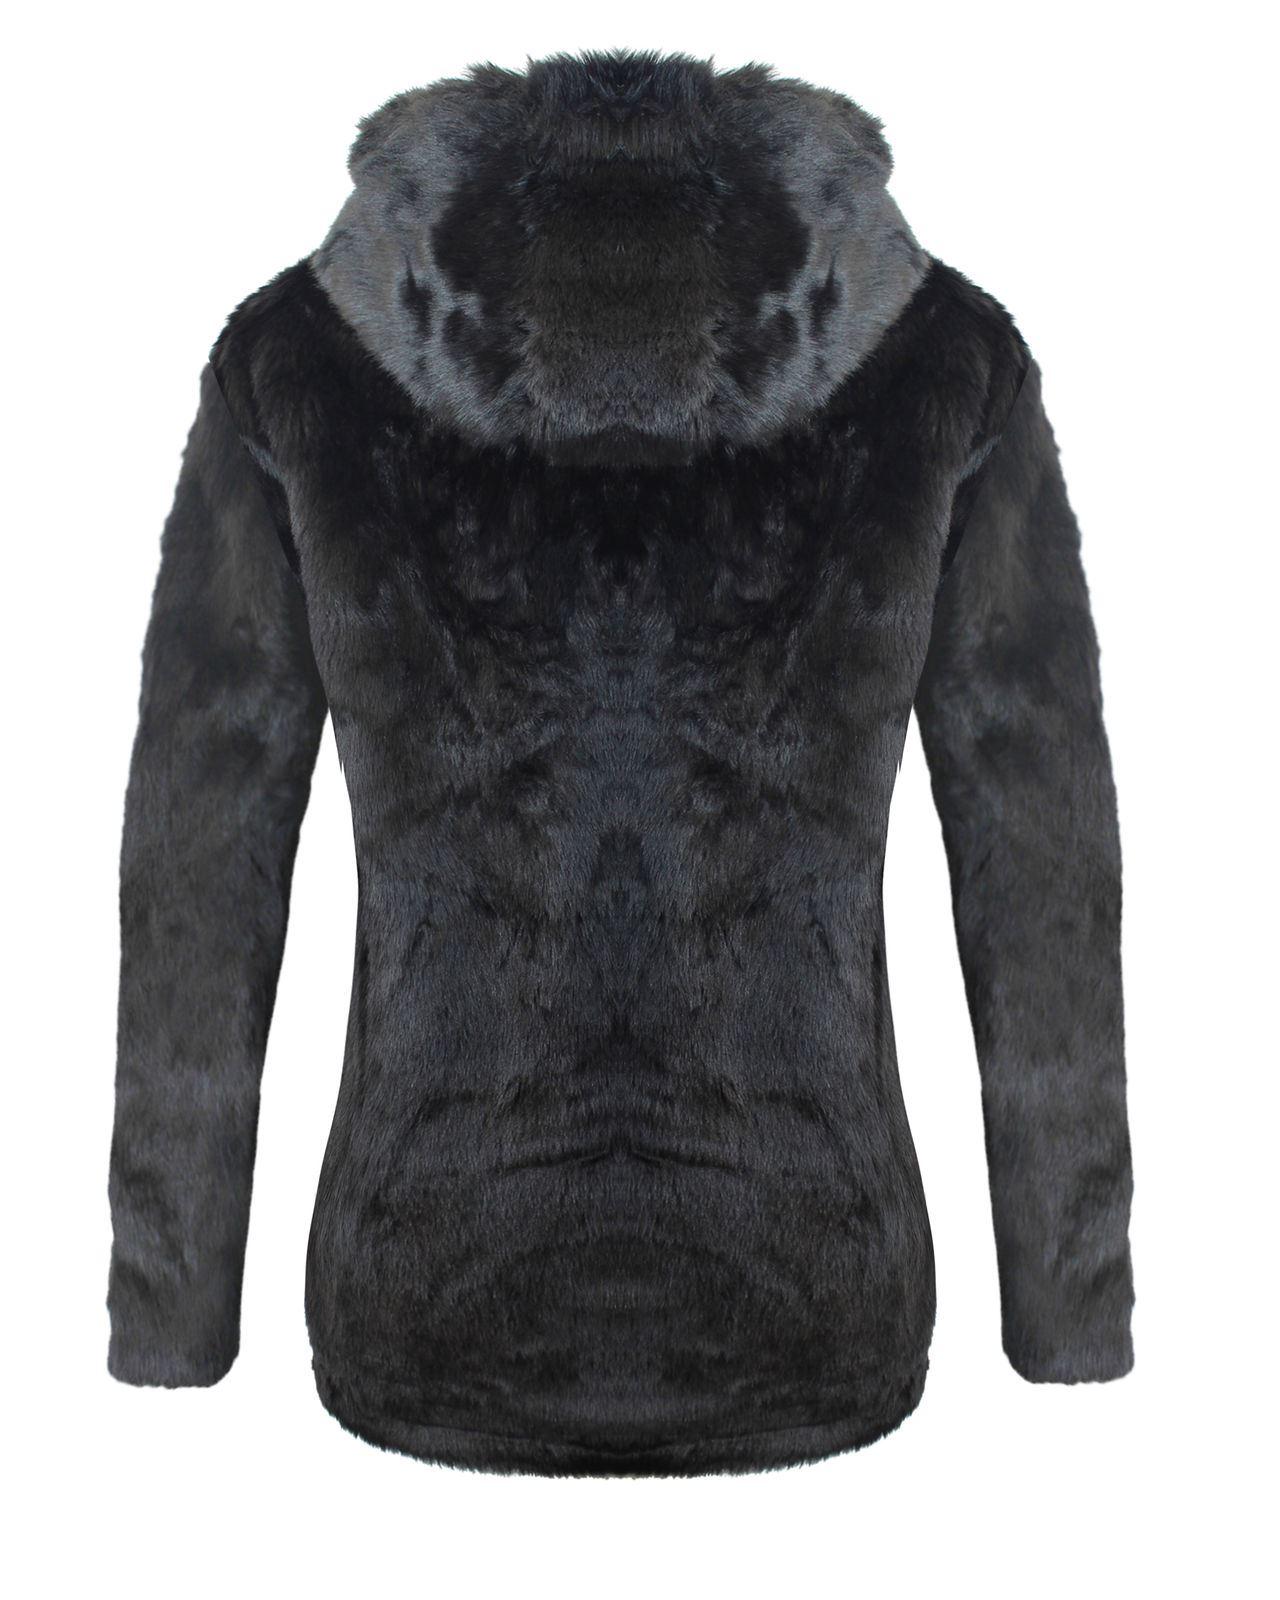 Mesdames Womens All Over fausse fourrure capuche veste manteau impression animale 8 10 12 14 16